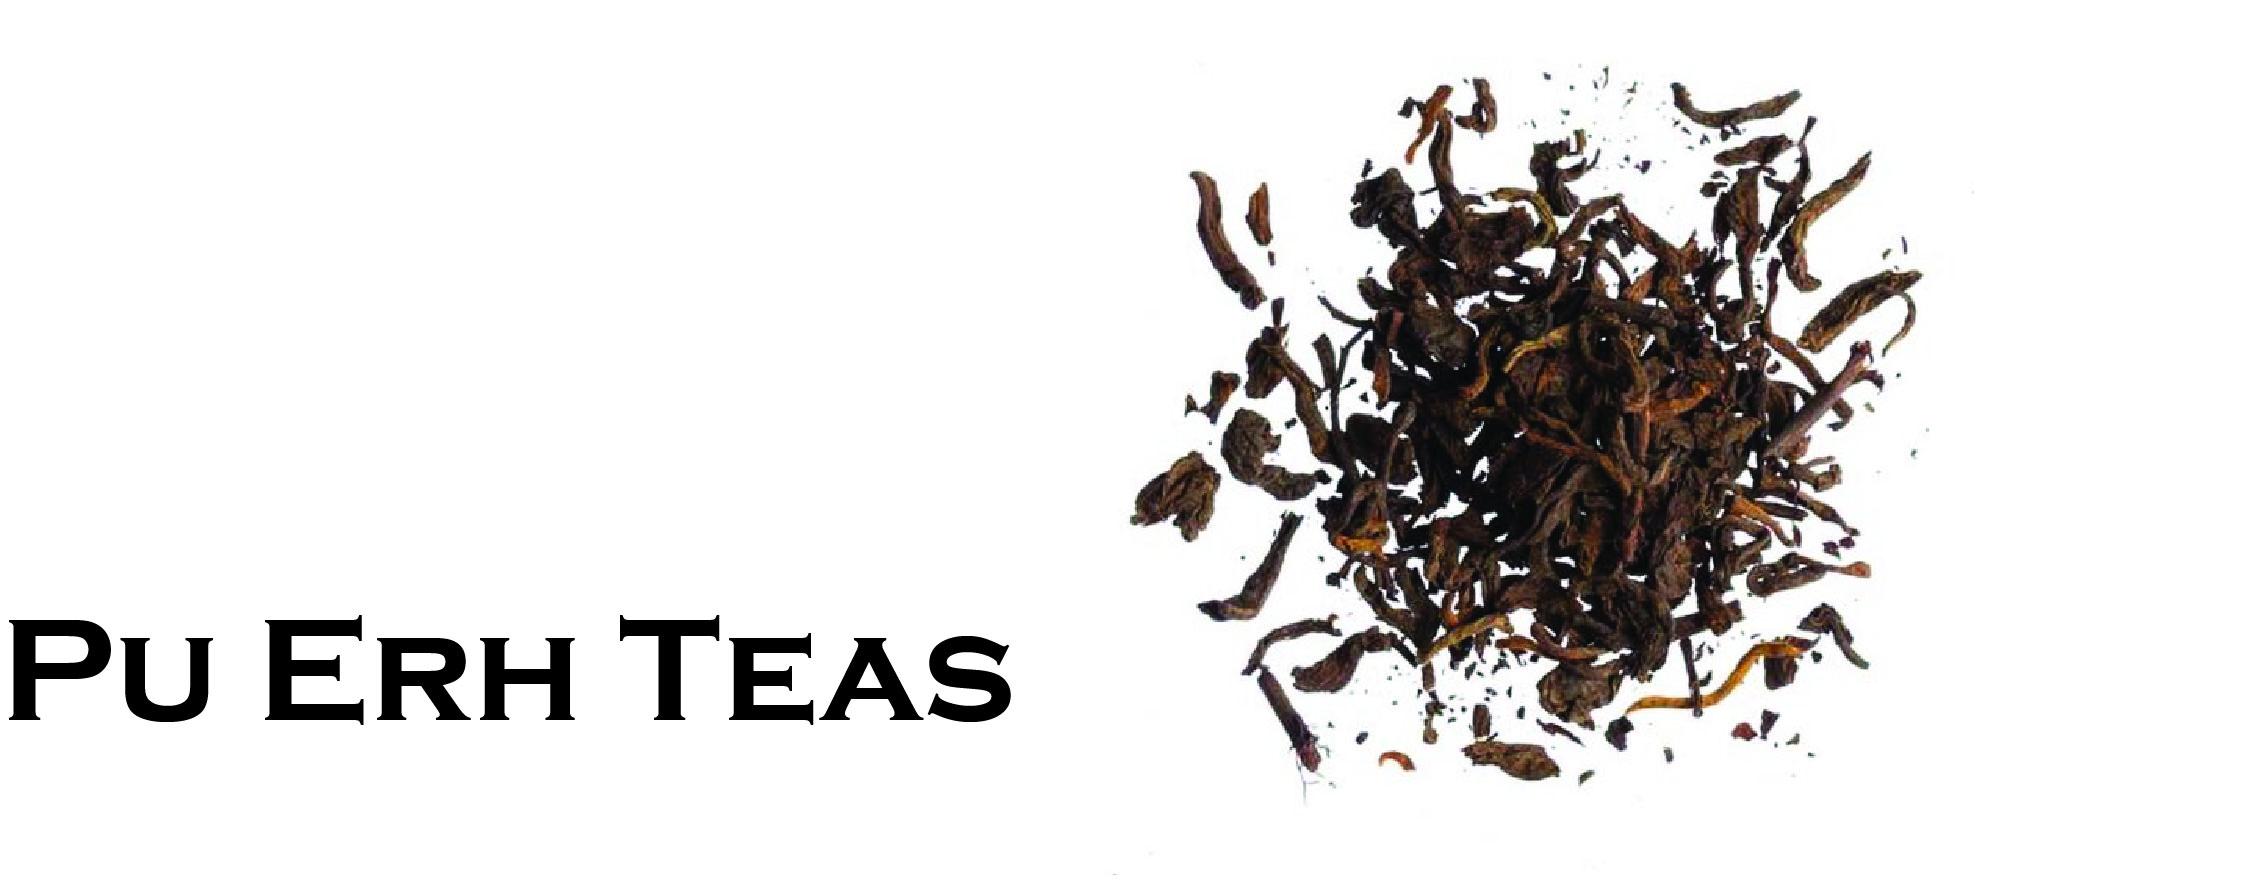 Cuban Brothers Premium Pu Erh Tea